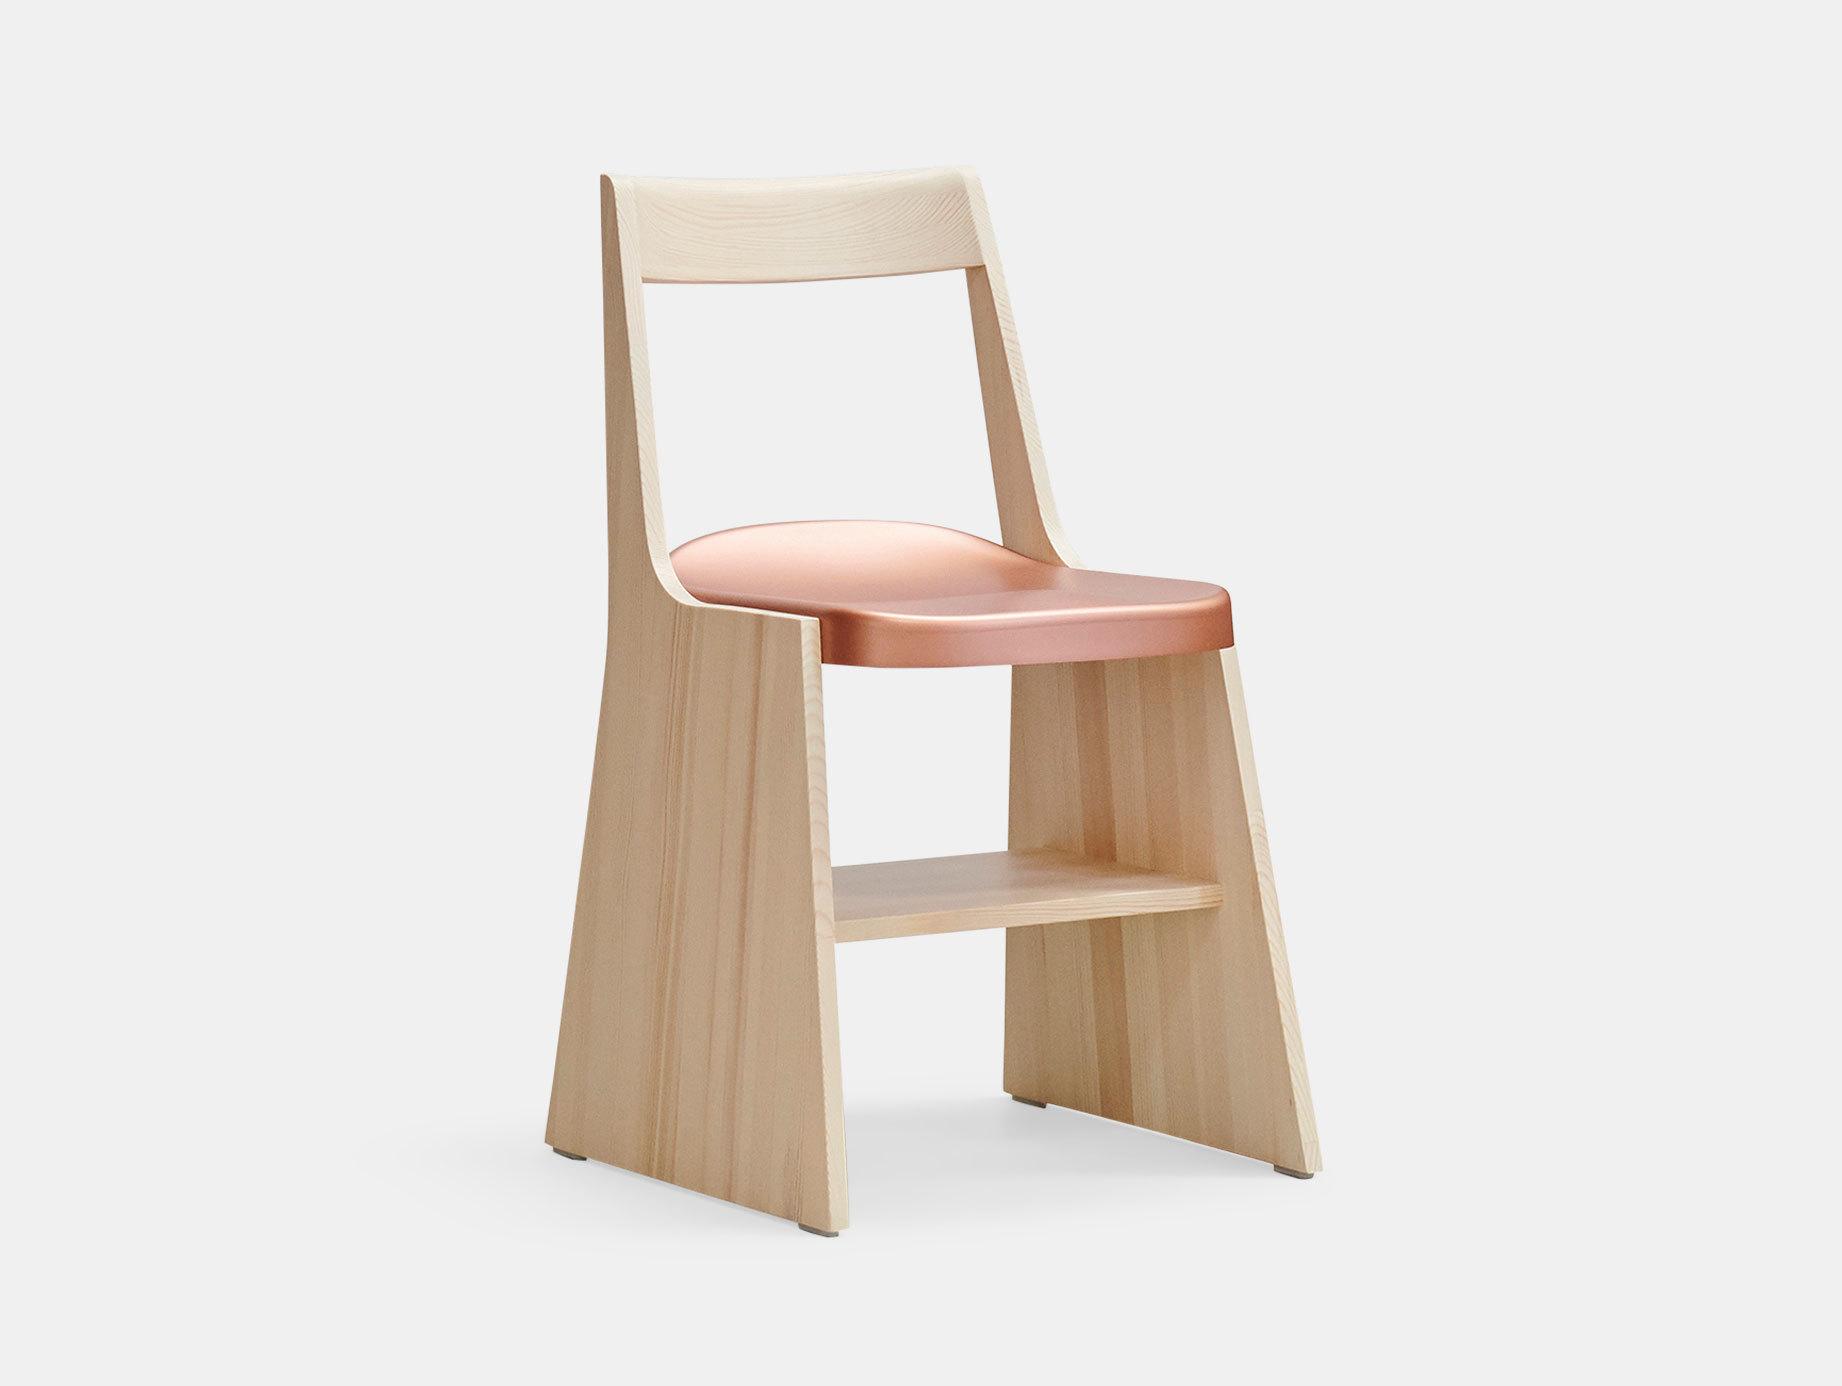 Mattiazzi Fronda Chair Pine Copper Seat Sam Hecht Kim Colin